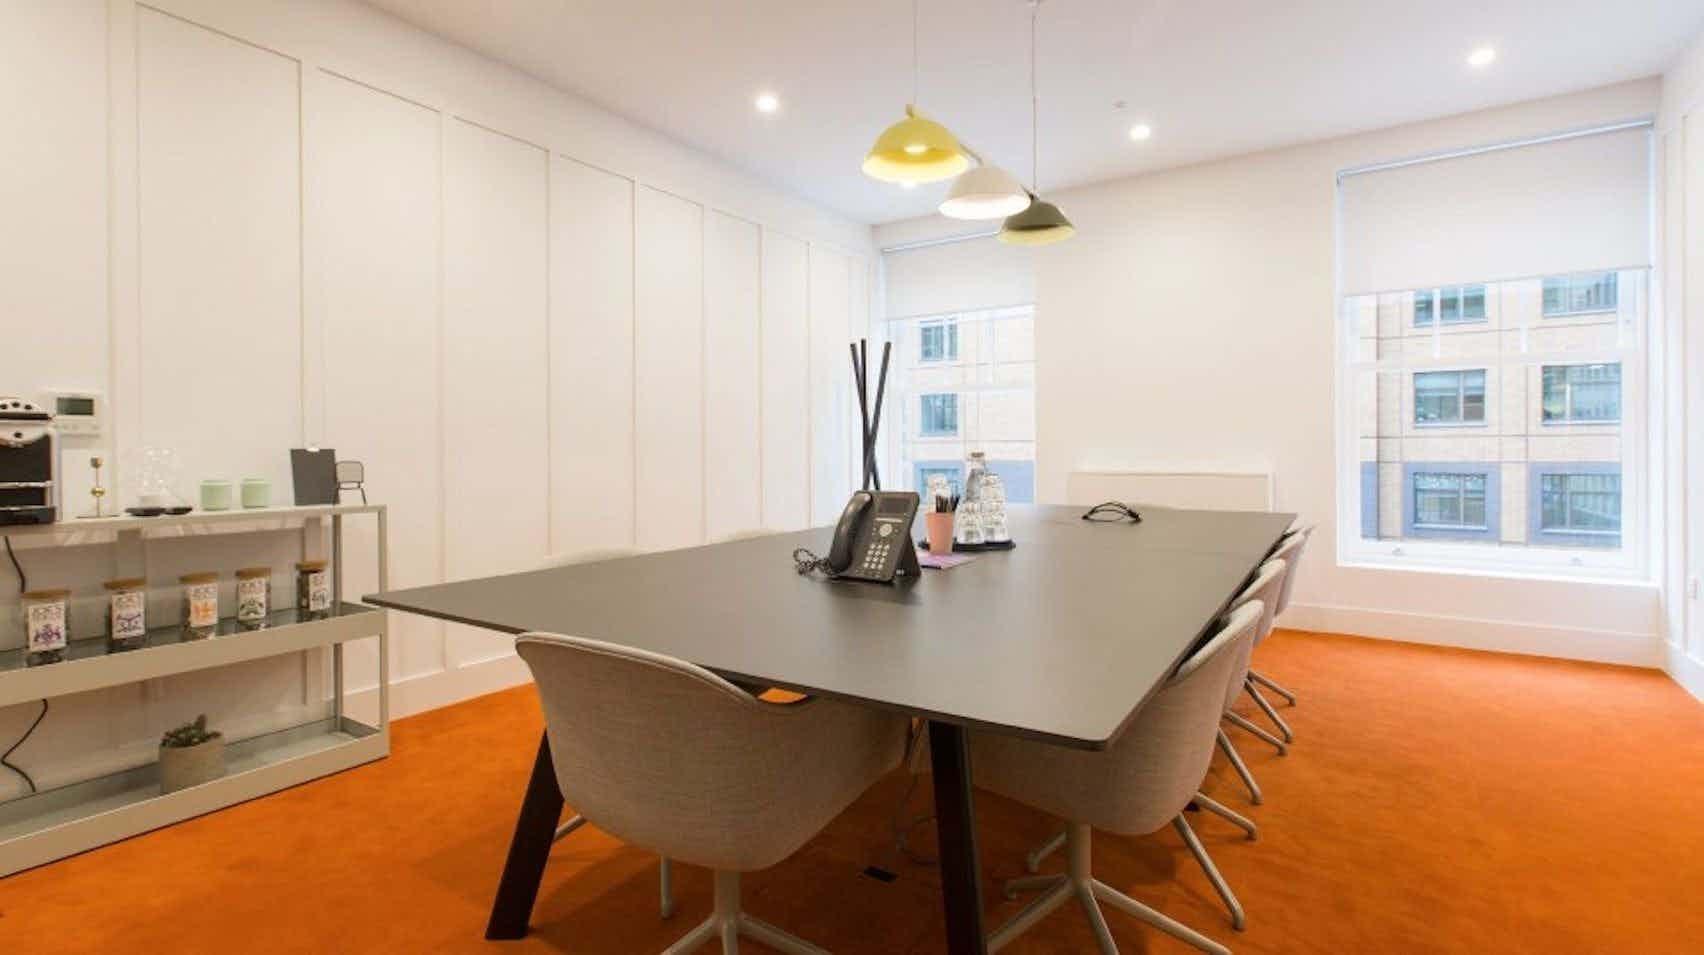 Meeting Room 7, TOG,  91 Wimpole Street